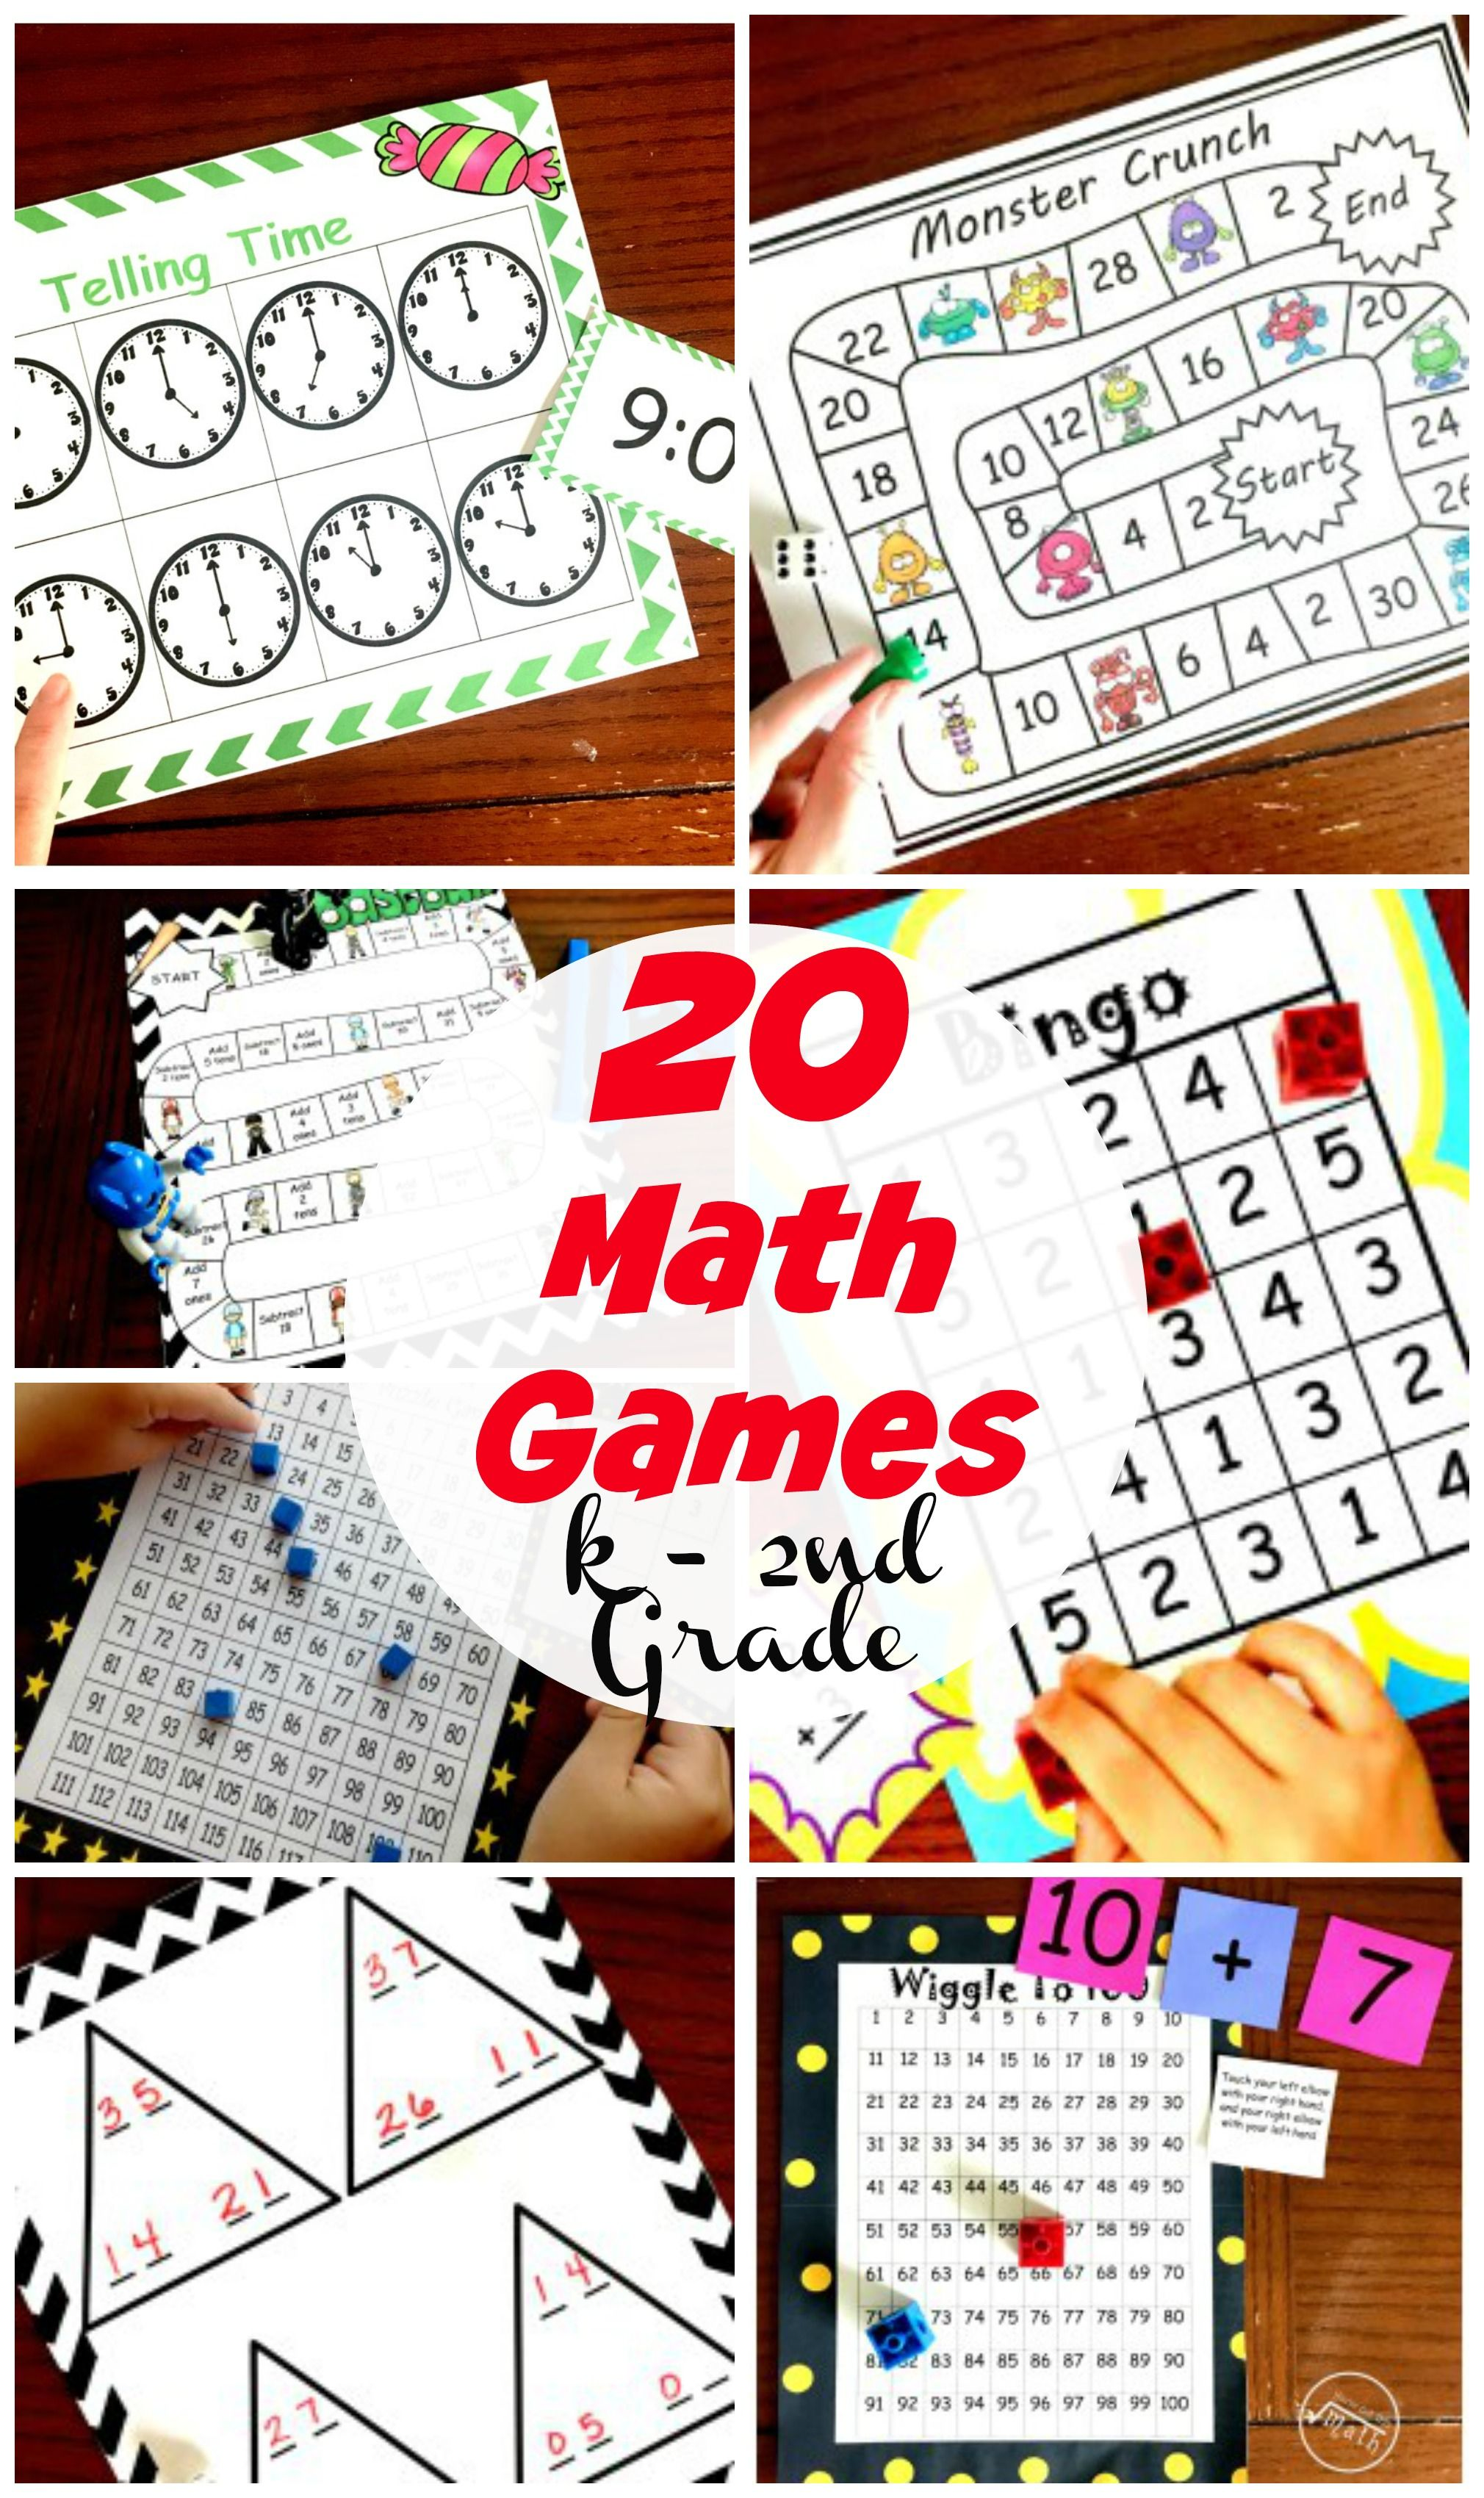 Math Games Online Kindergarten Guide At Games Api Ufc Com